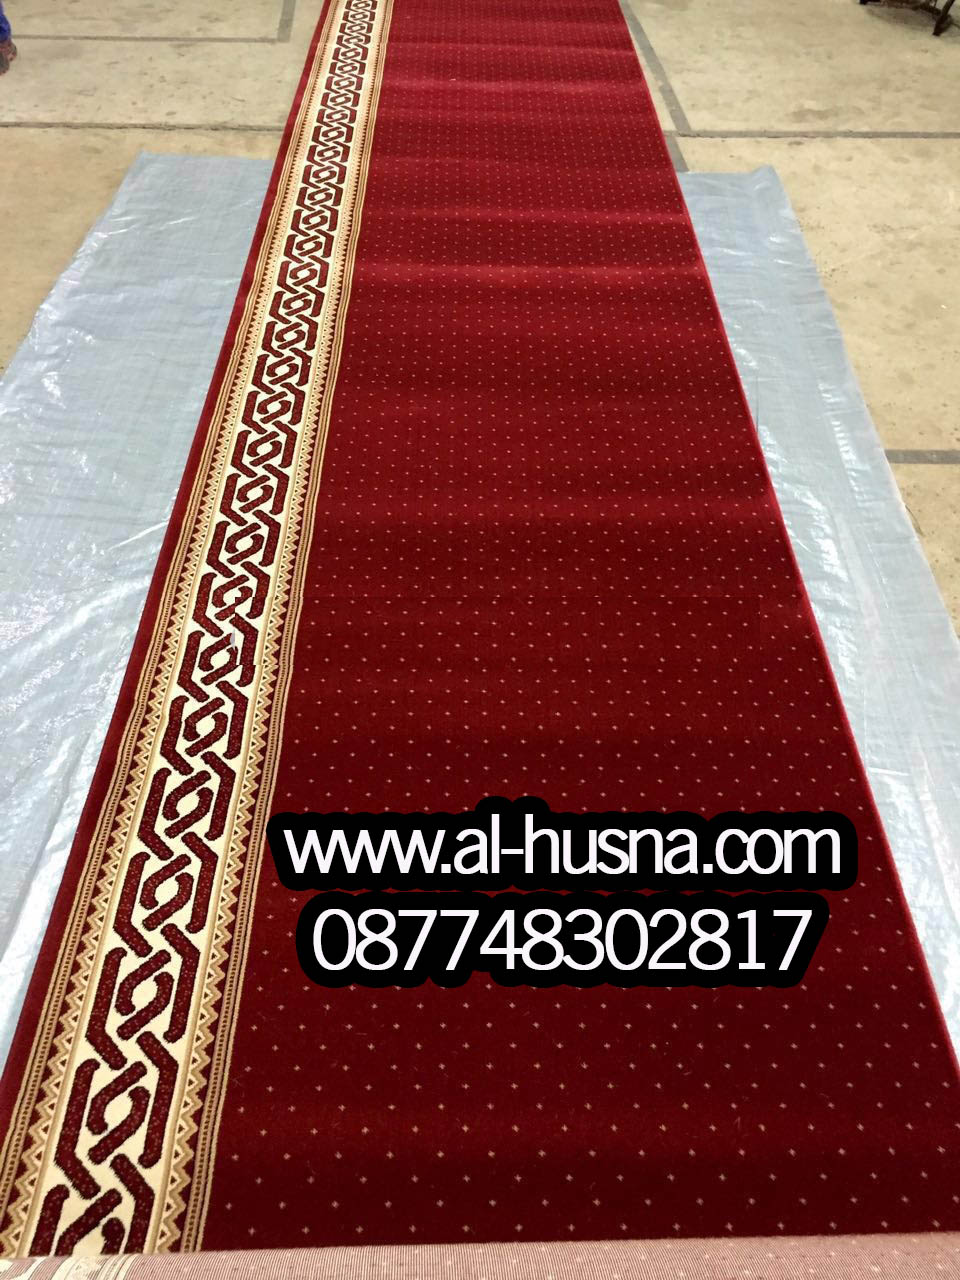 Jual karpet sajadah masjid per roll di pulo gadung jakarta